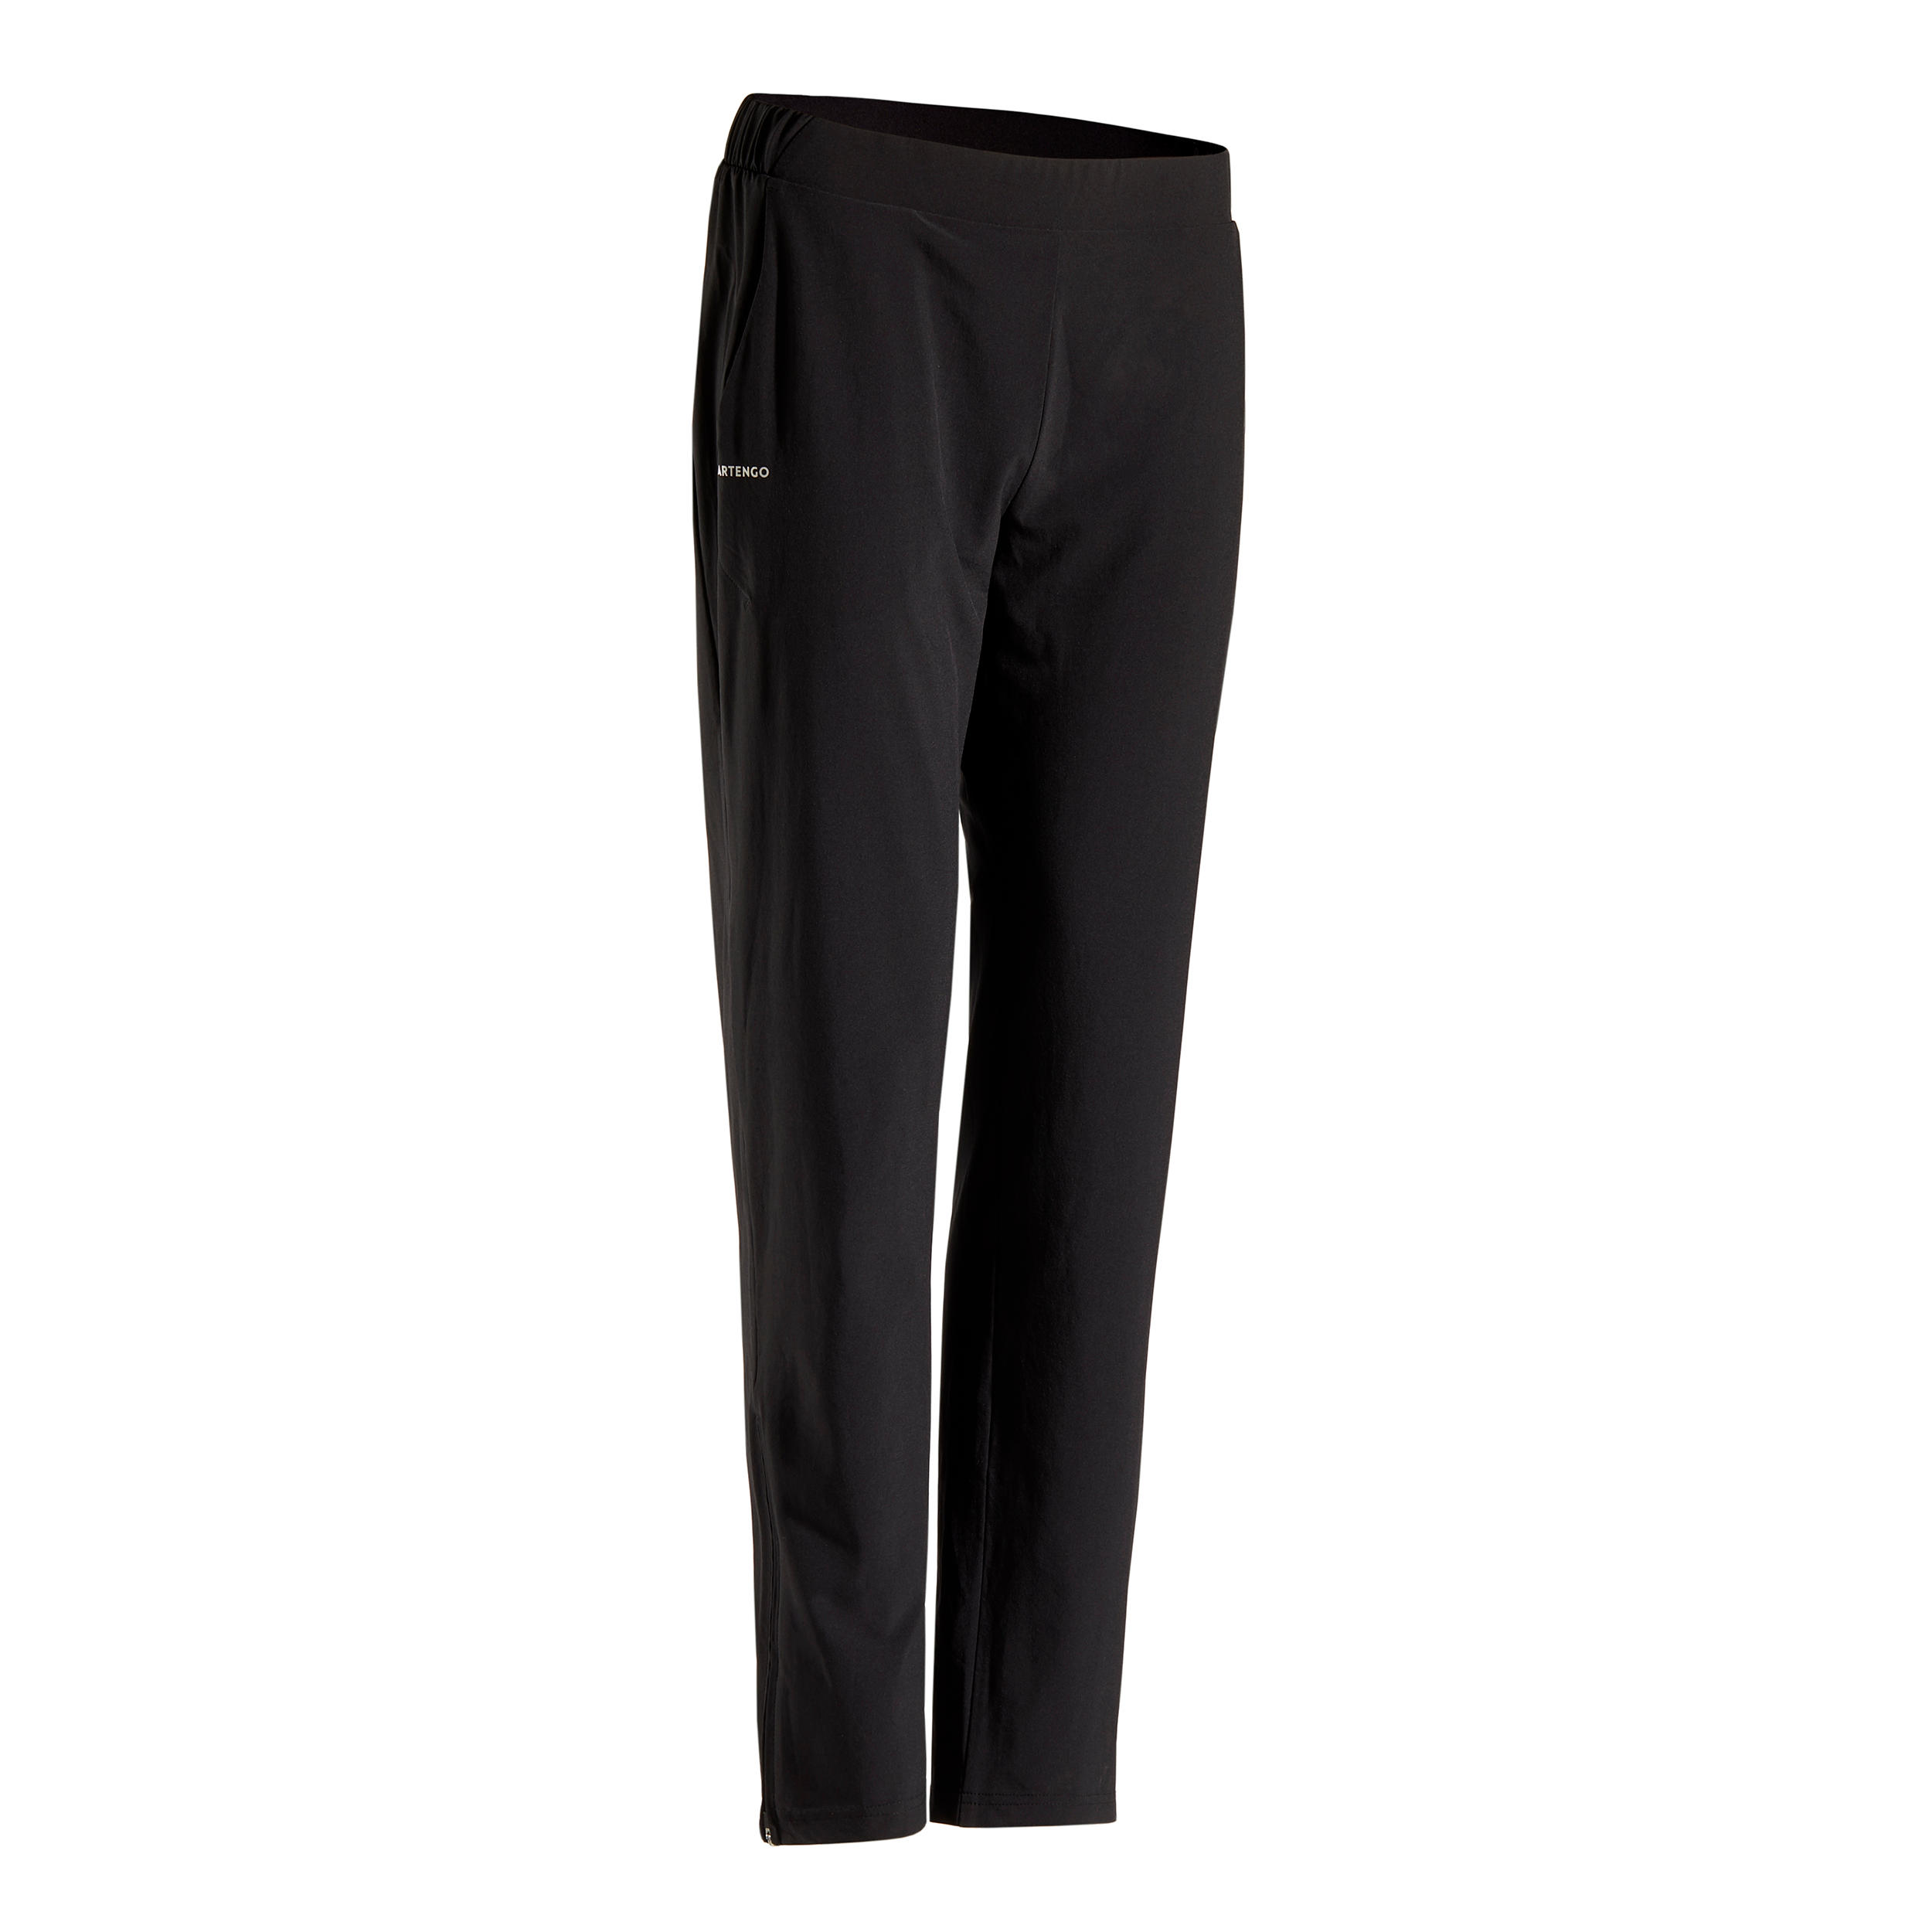 Pantalon Tenis Dry 500 Damă imagine